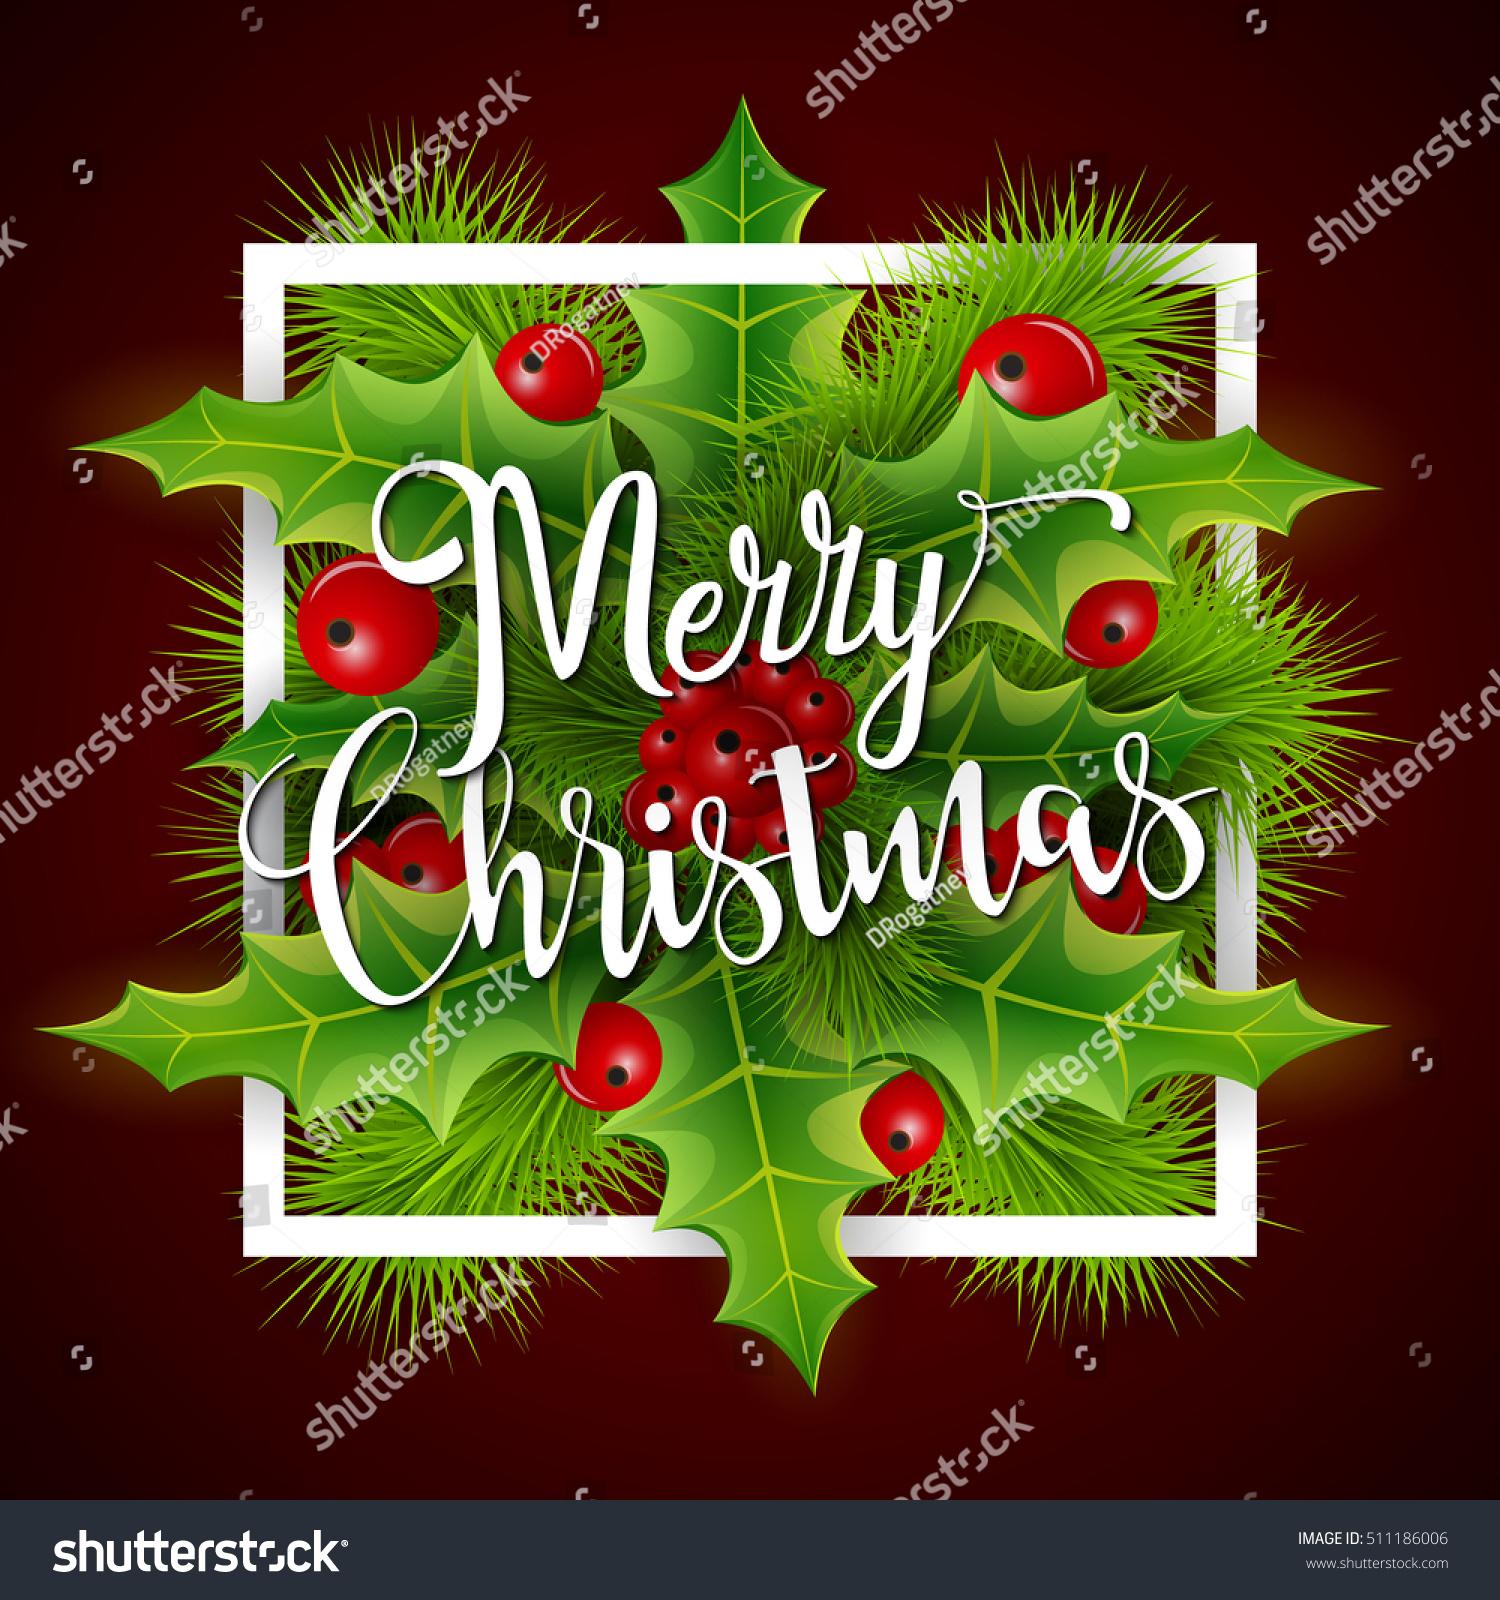 Merry Christmas Greetings Card Christmas Holly Stock Illustration